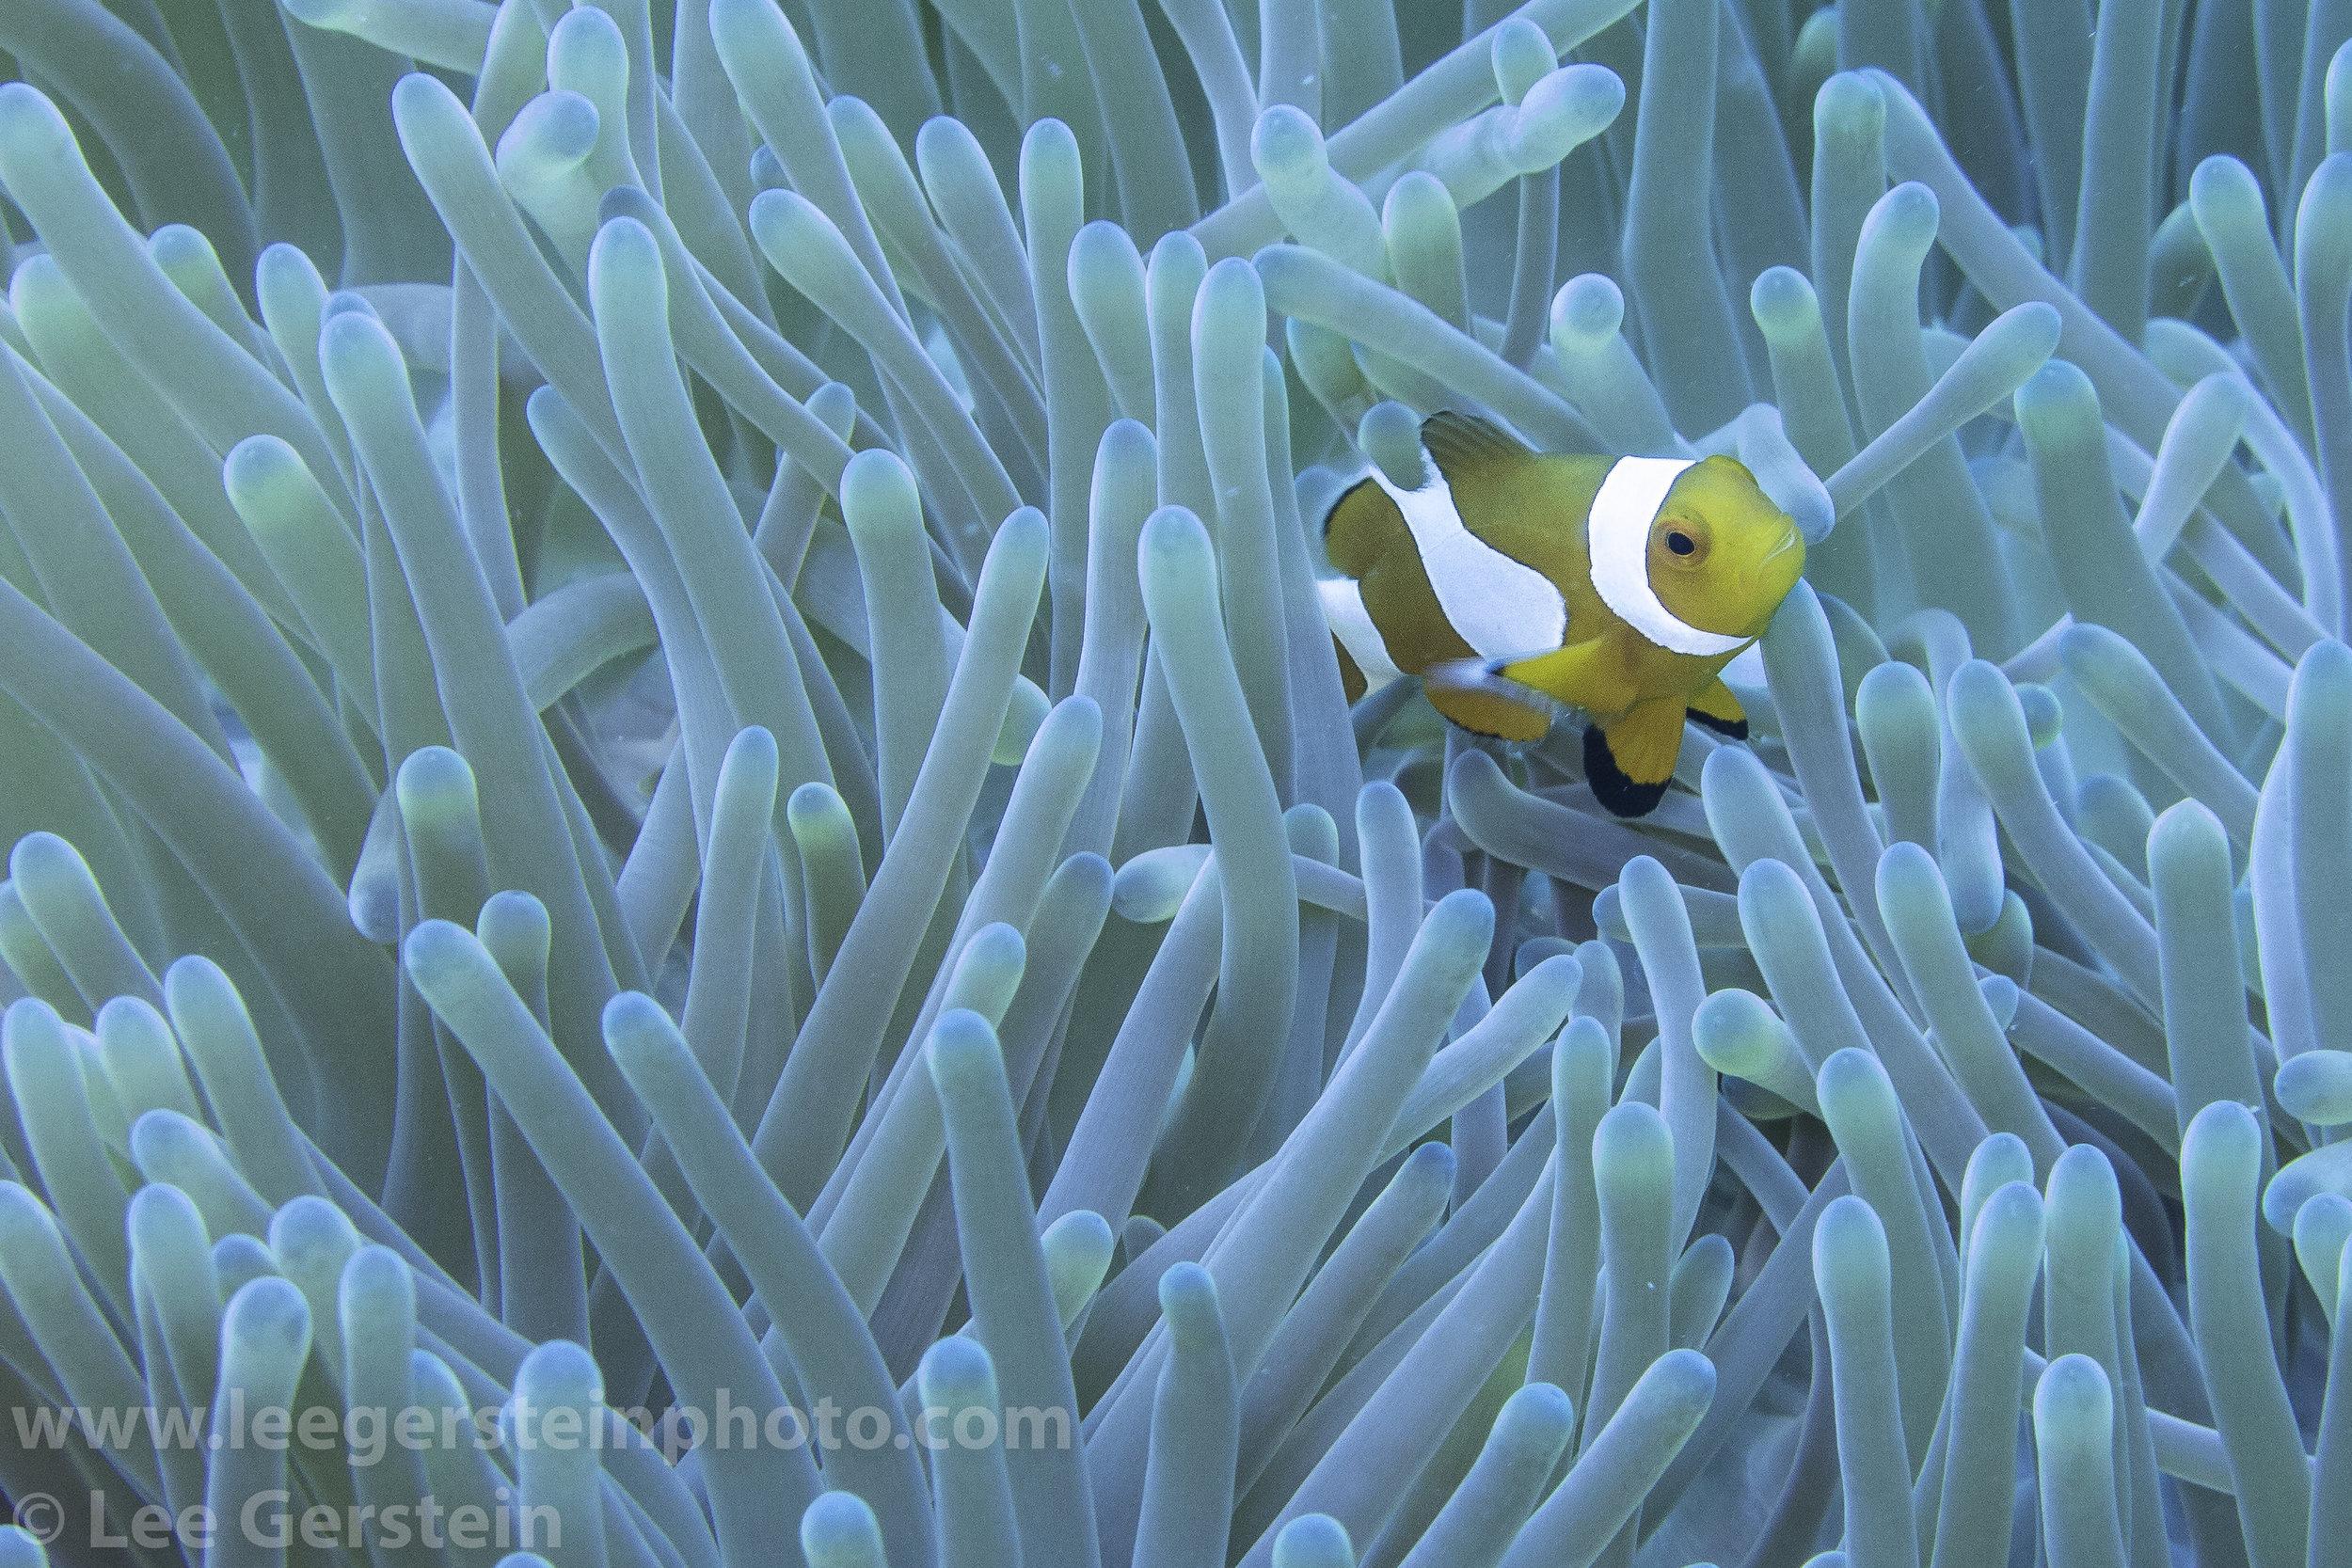 False Clown Anemone Fish